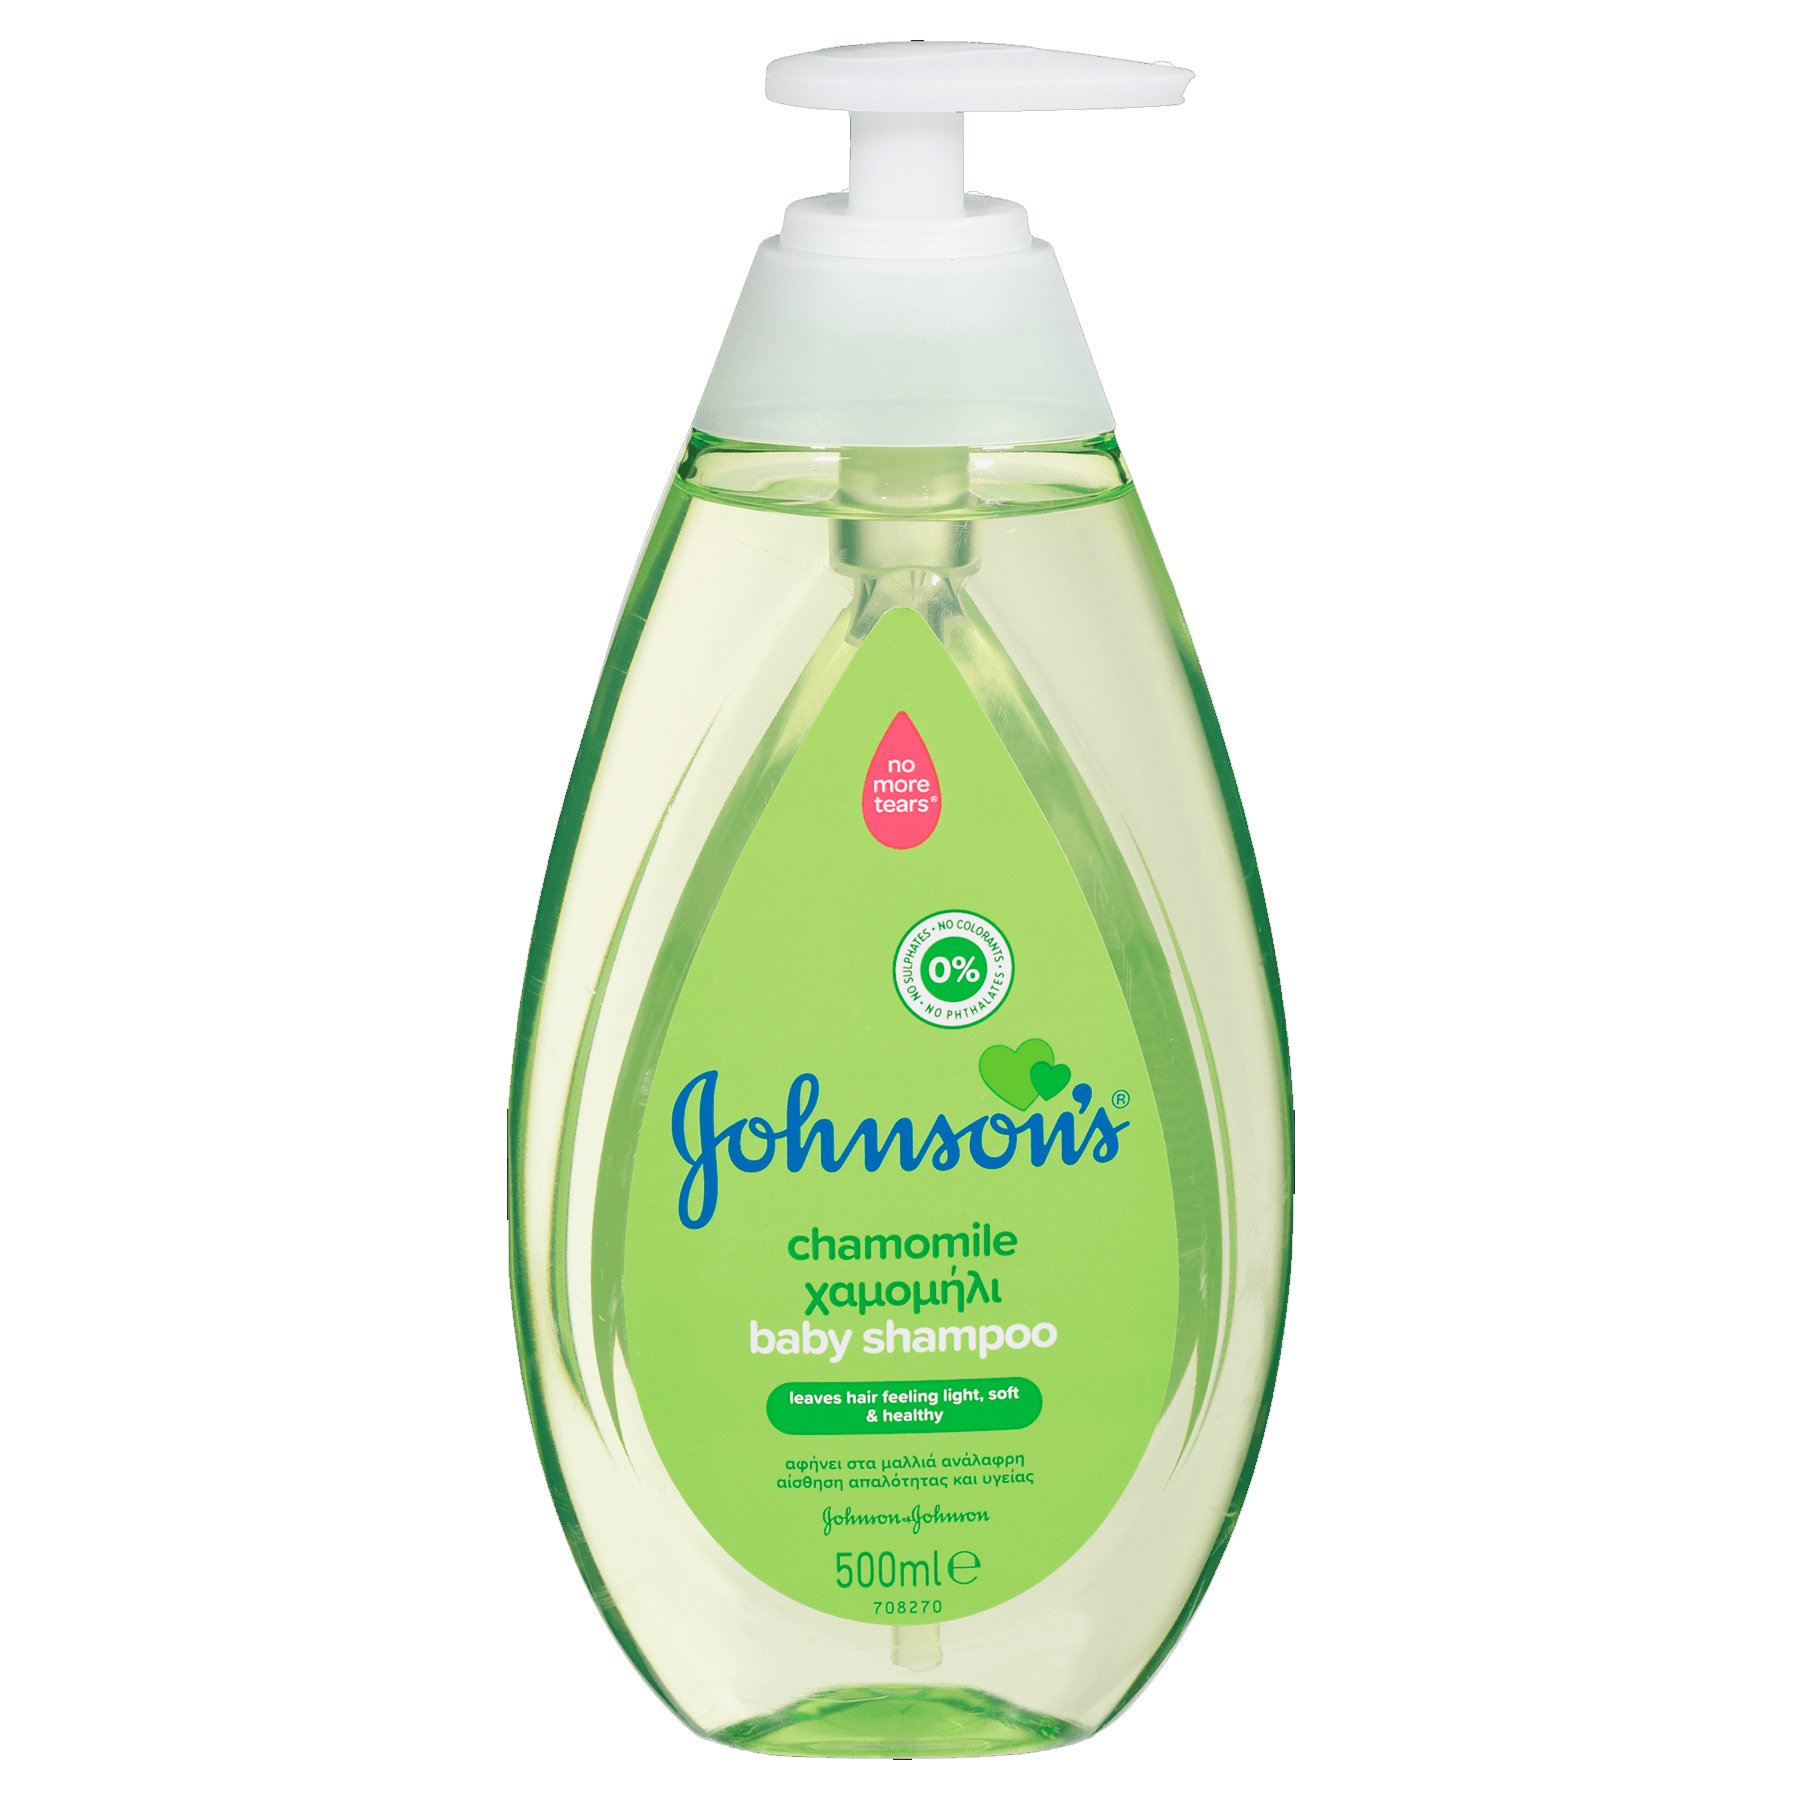 Johnson's Baby Shampoo Chamomile Βρεφικό Σαμπουάν με Χαμομήλι για Αίσθηση Απαλότητας & Υγείας στα Μαλλάκια 500ml